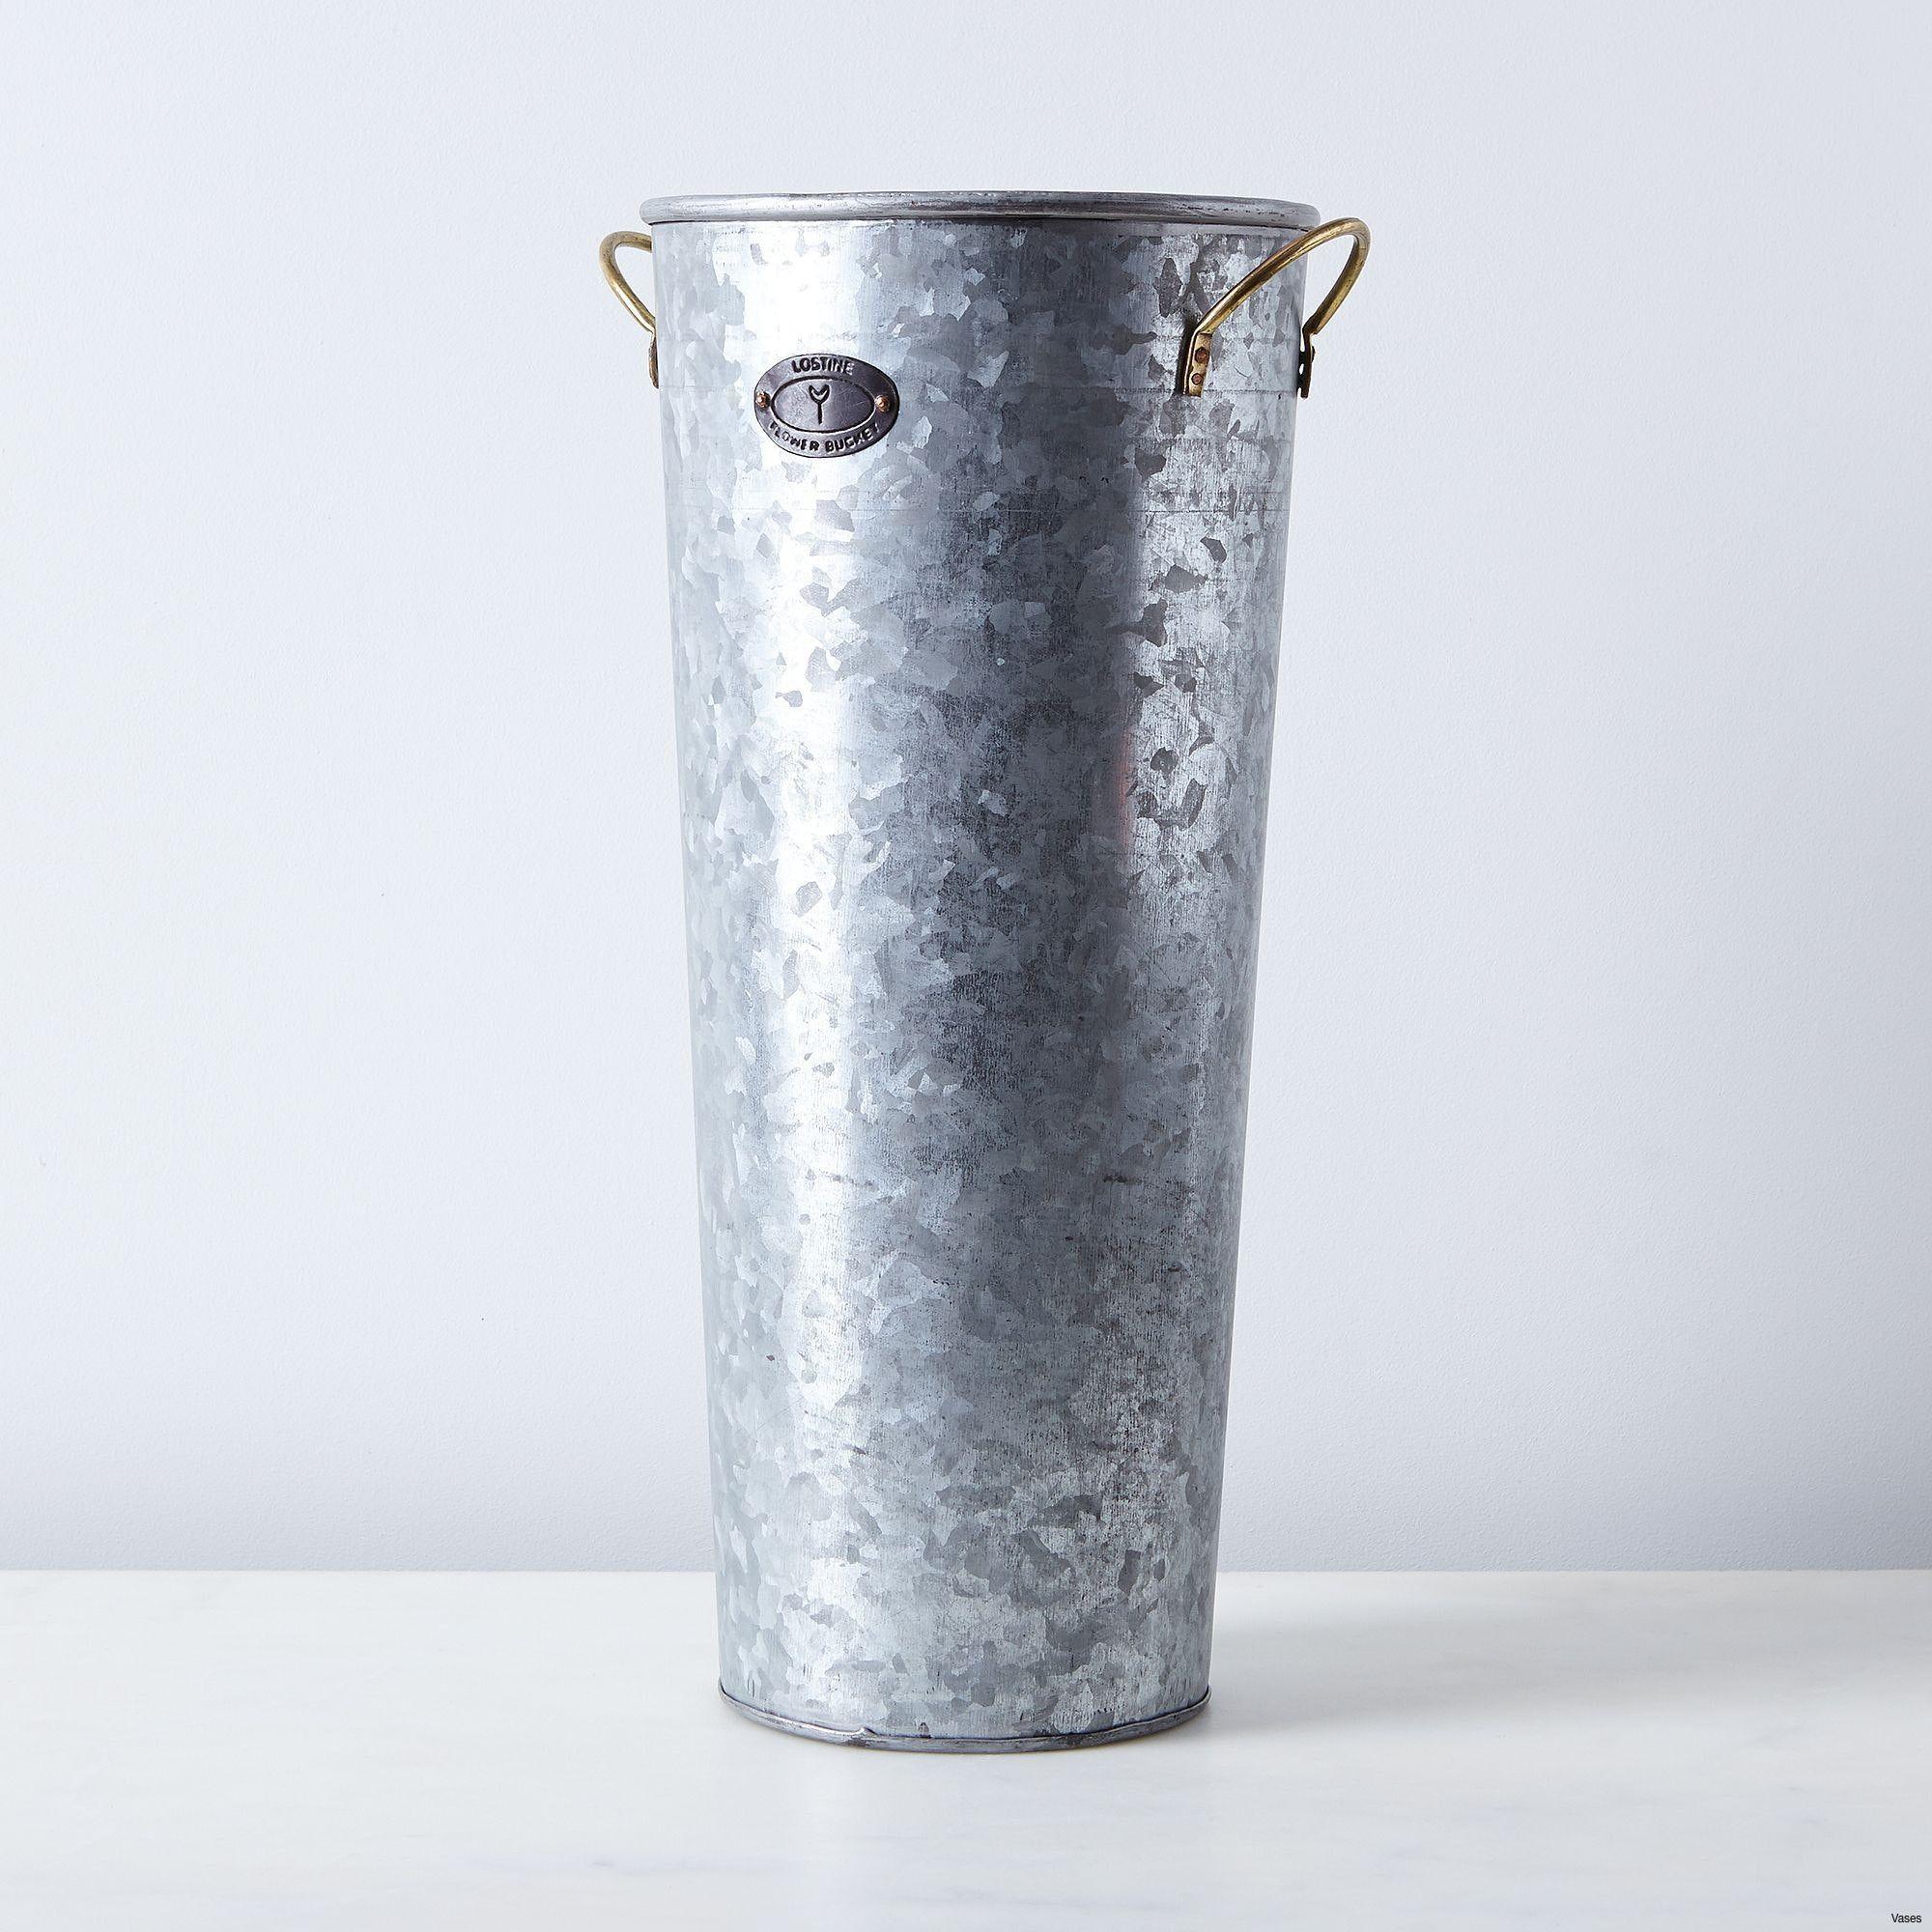 van gogh vase of 50 smoked glass vase the weekly world in 32 unique metal vase